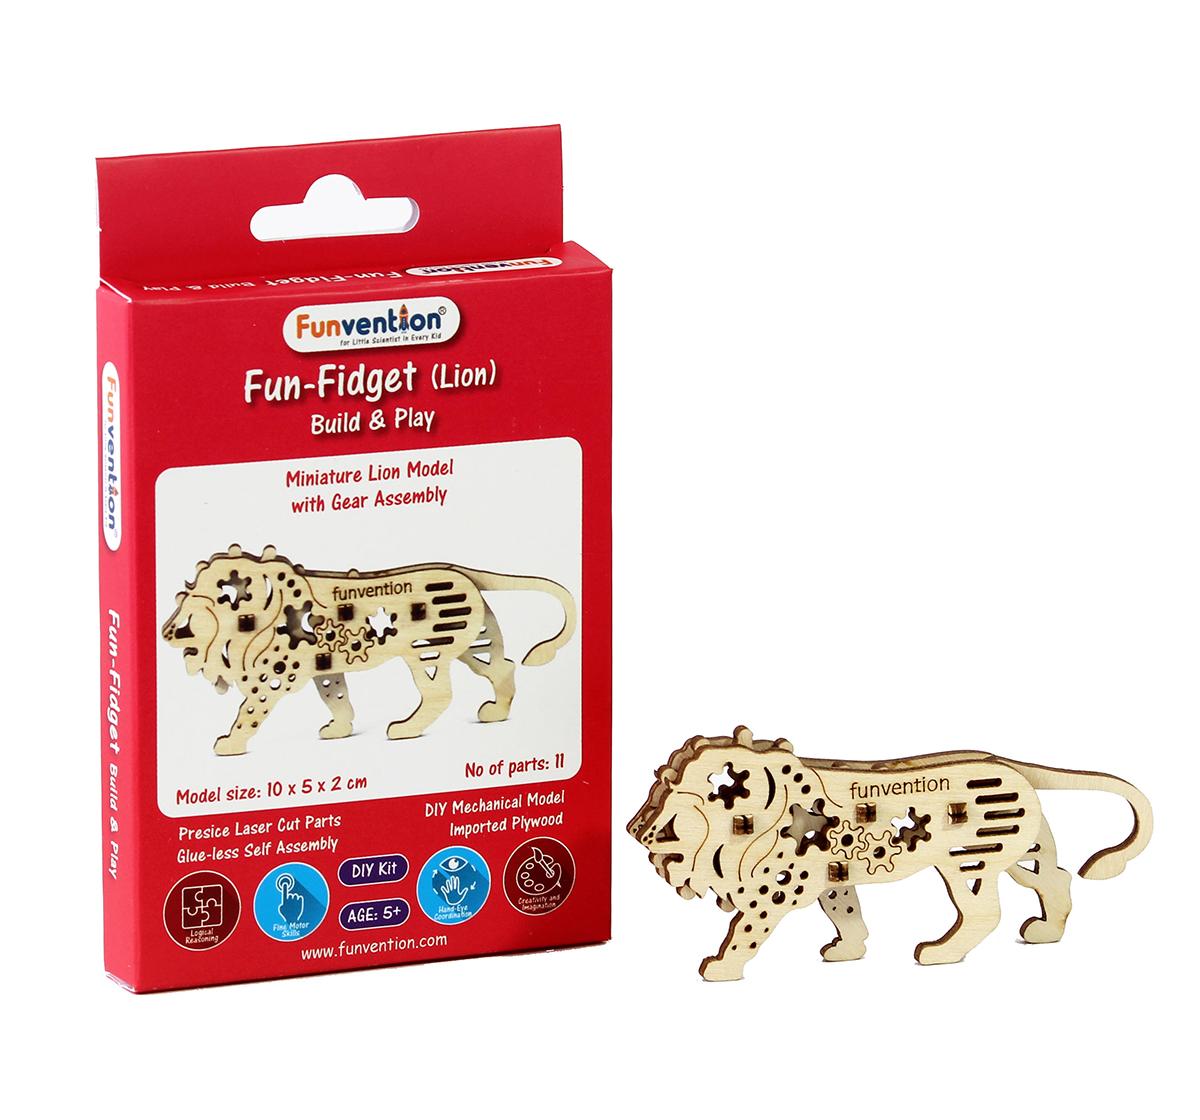 Funvention | Funvention Fun Fidgets - Jungle - Lion Model Stem for Kids Age 5Y+